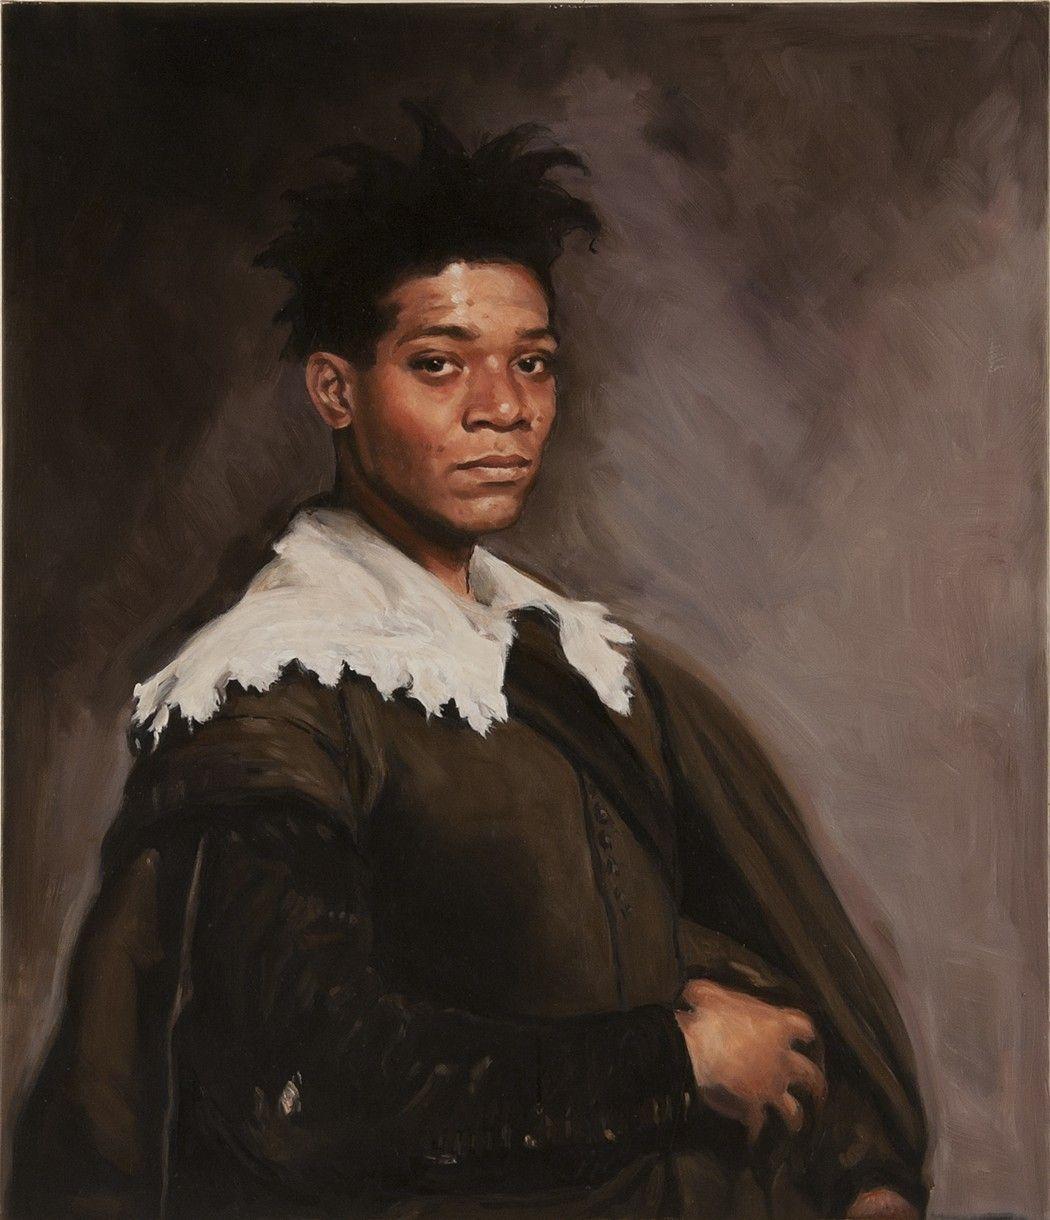 Basquiat portrait